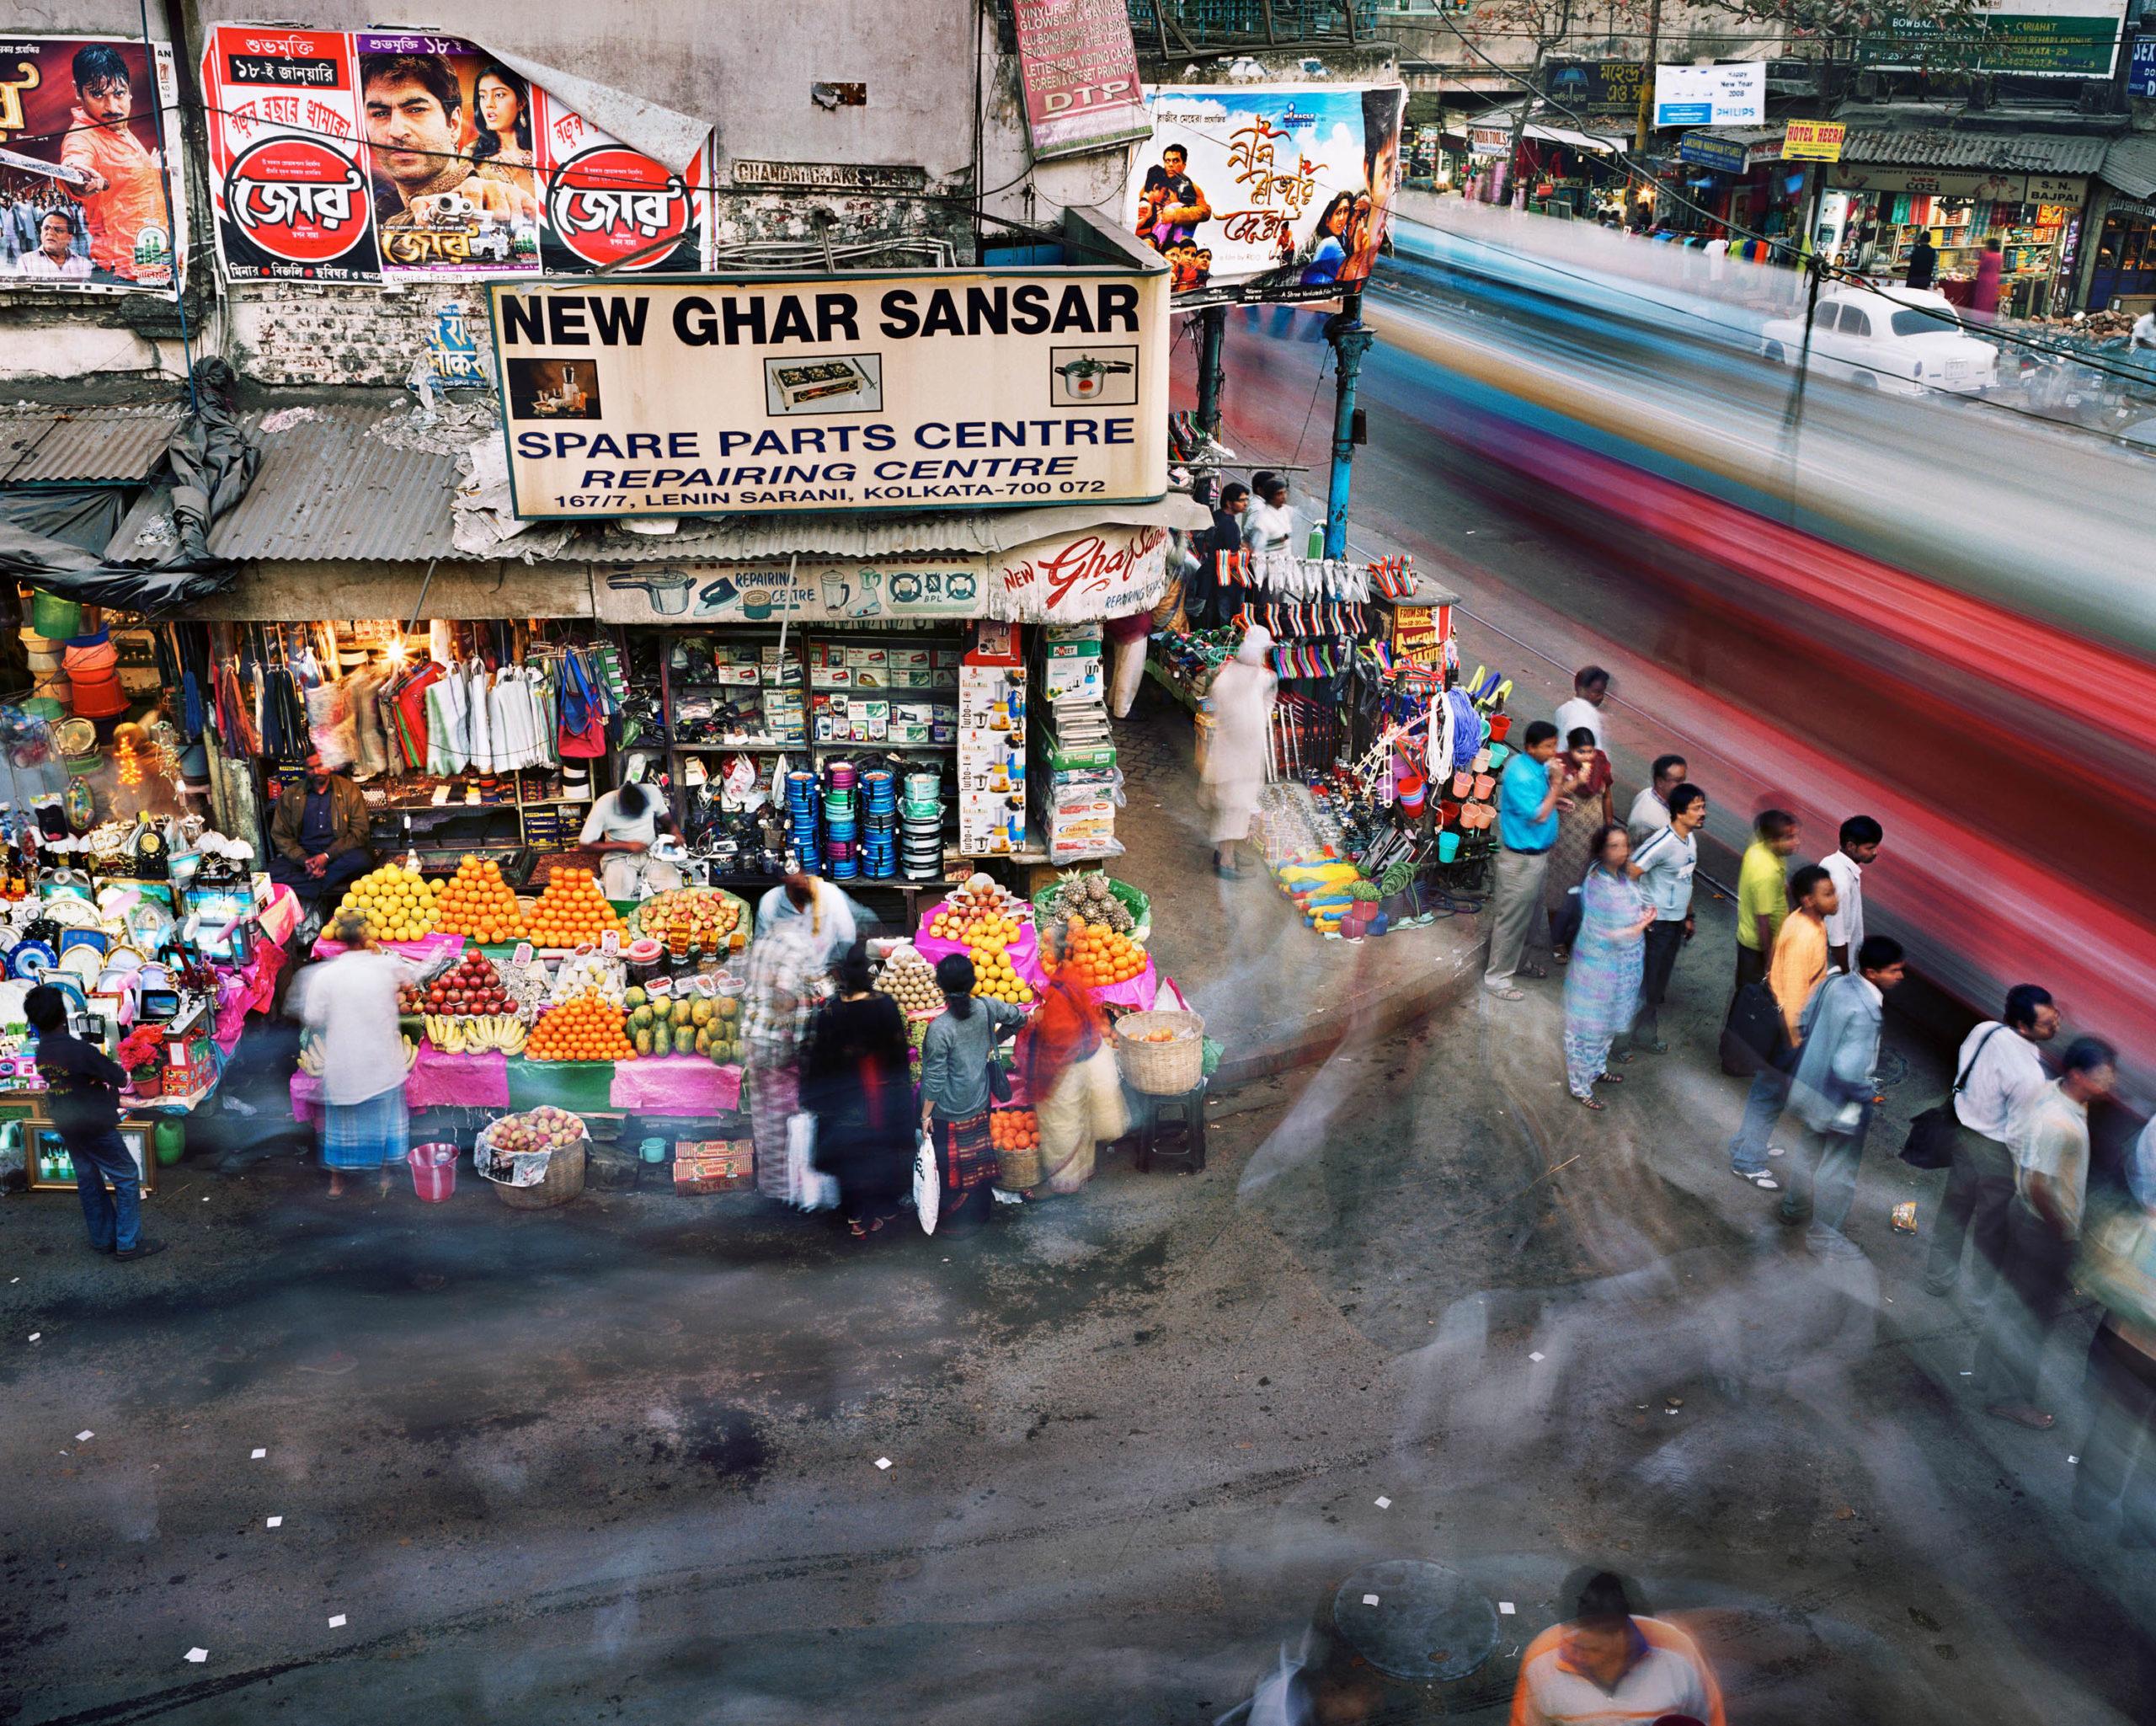 Chandni Chowk Street and Lenin Sarani, Chandni Chowk, Kolkata, India